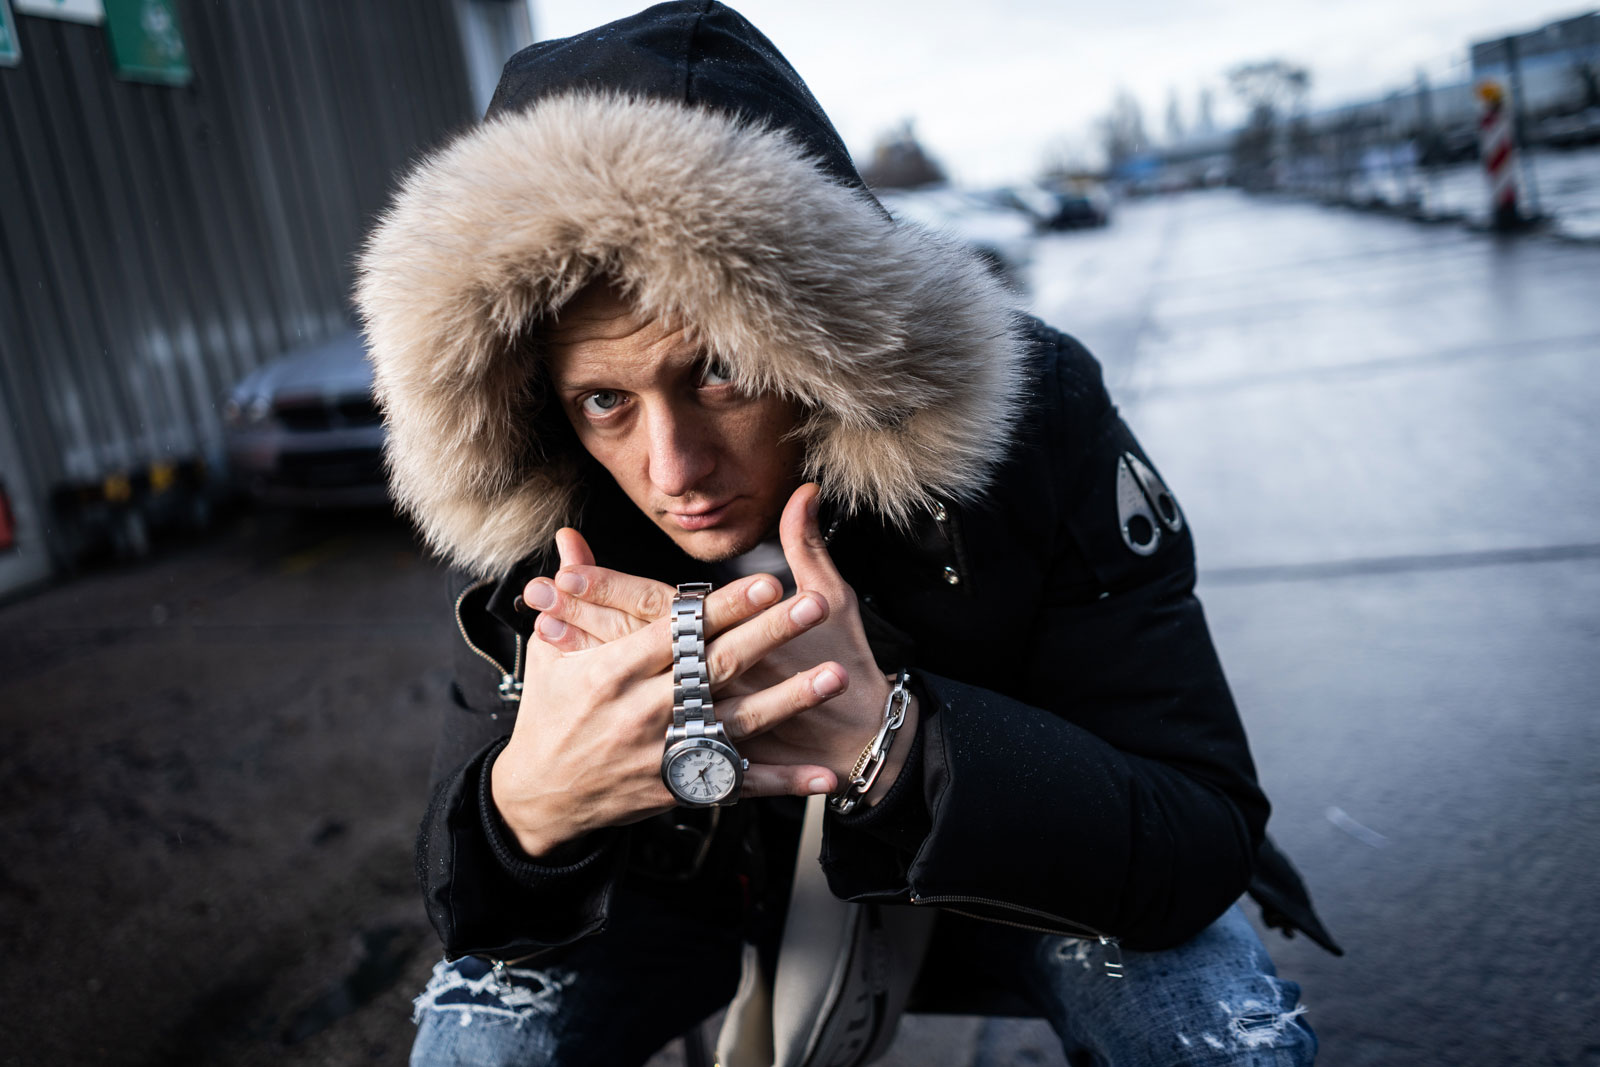 Olexesh, Rapper